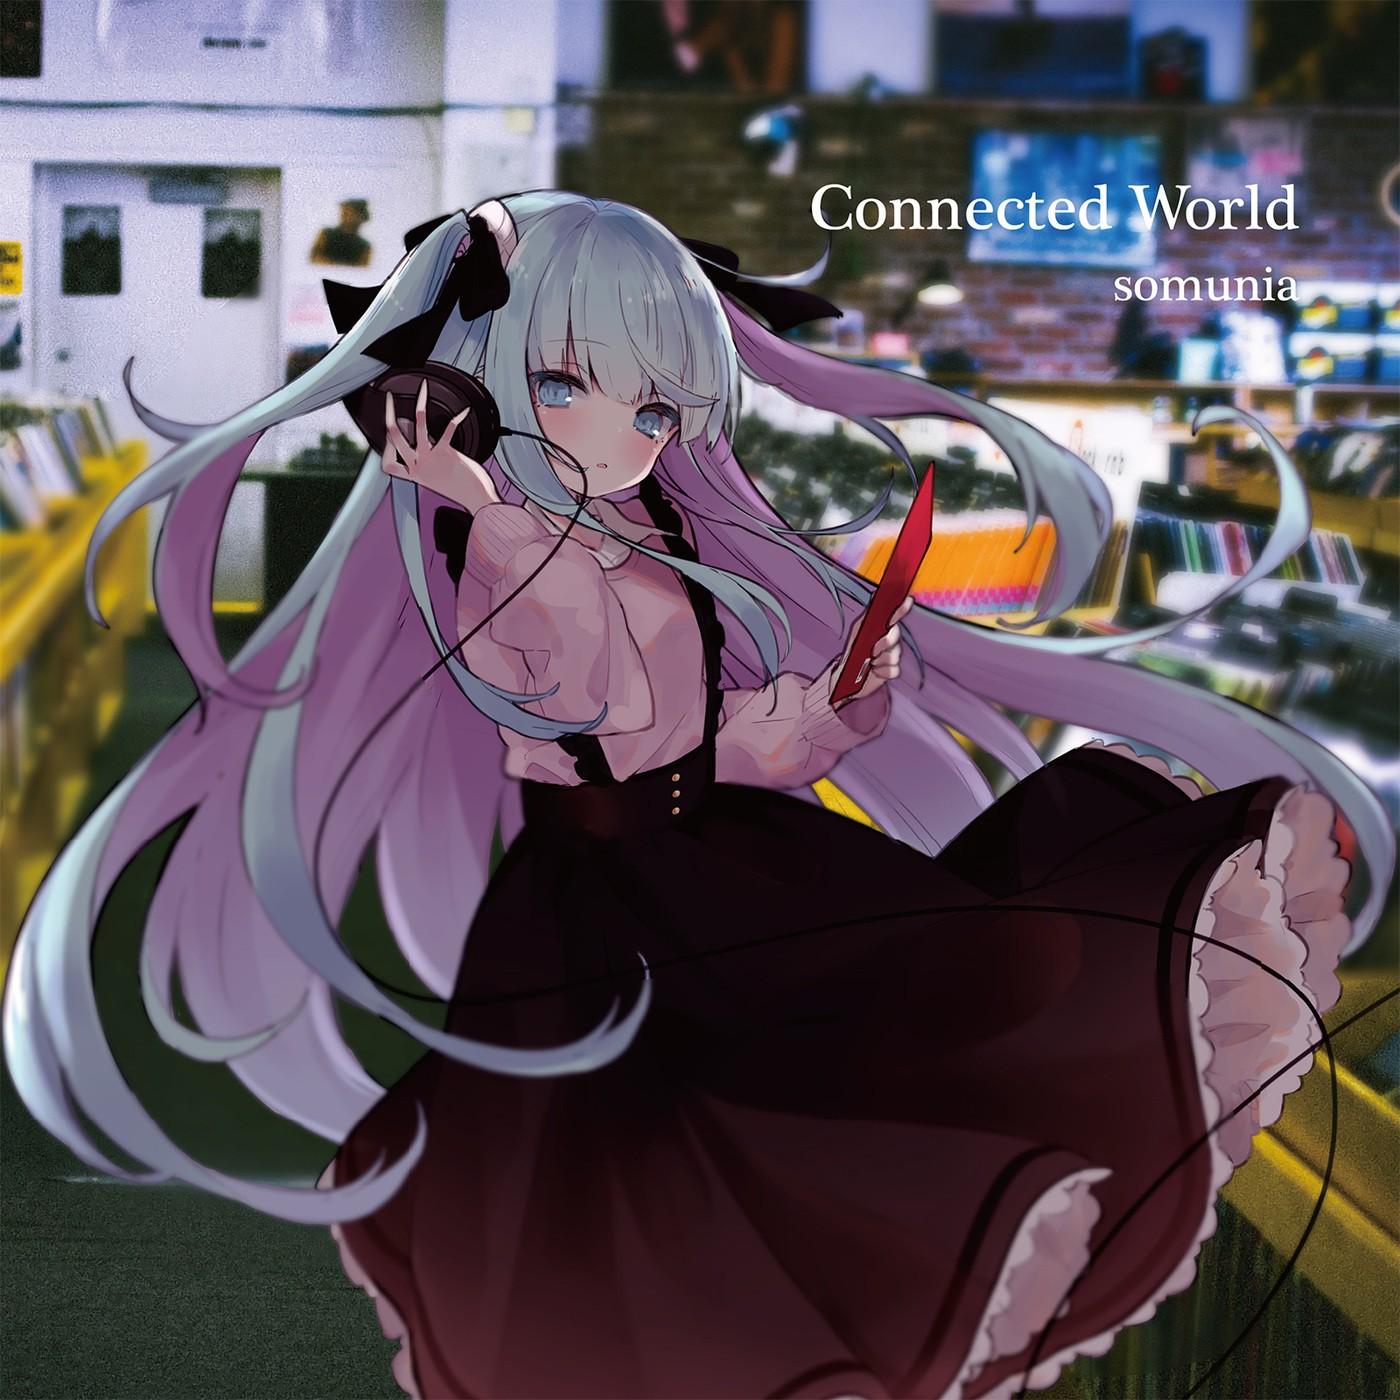 somunia – Connected World [FLAC + MP3 320 / WEB] [2018.10.28]